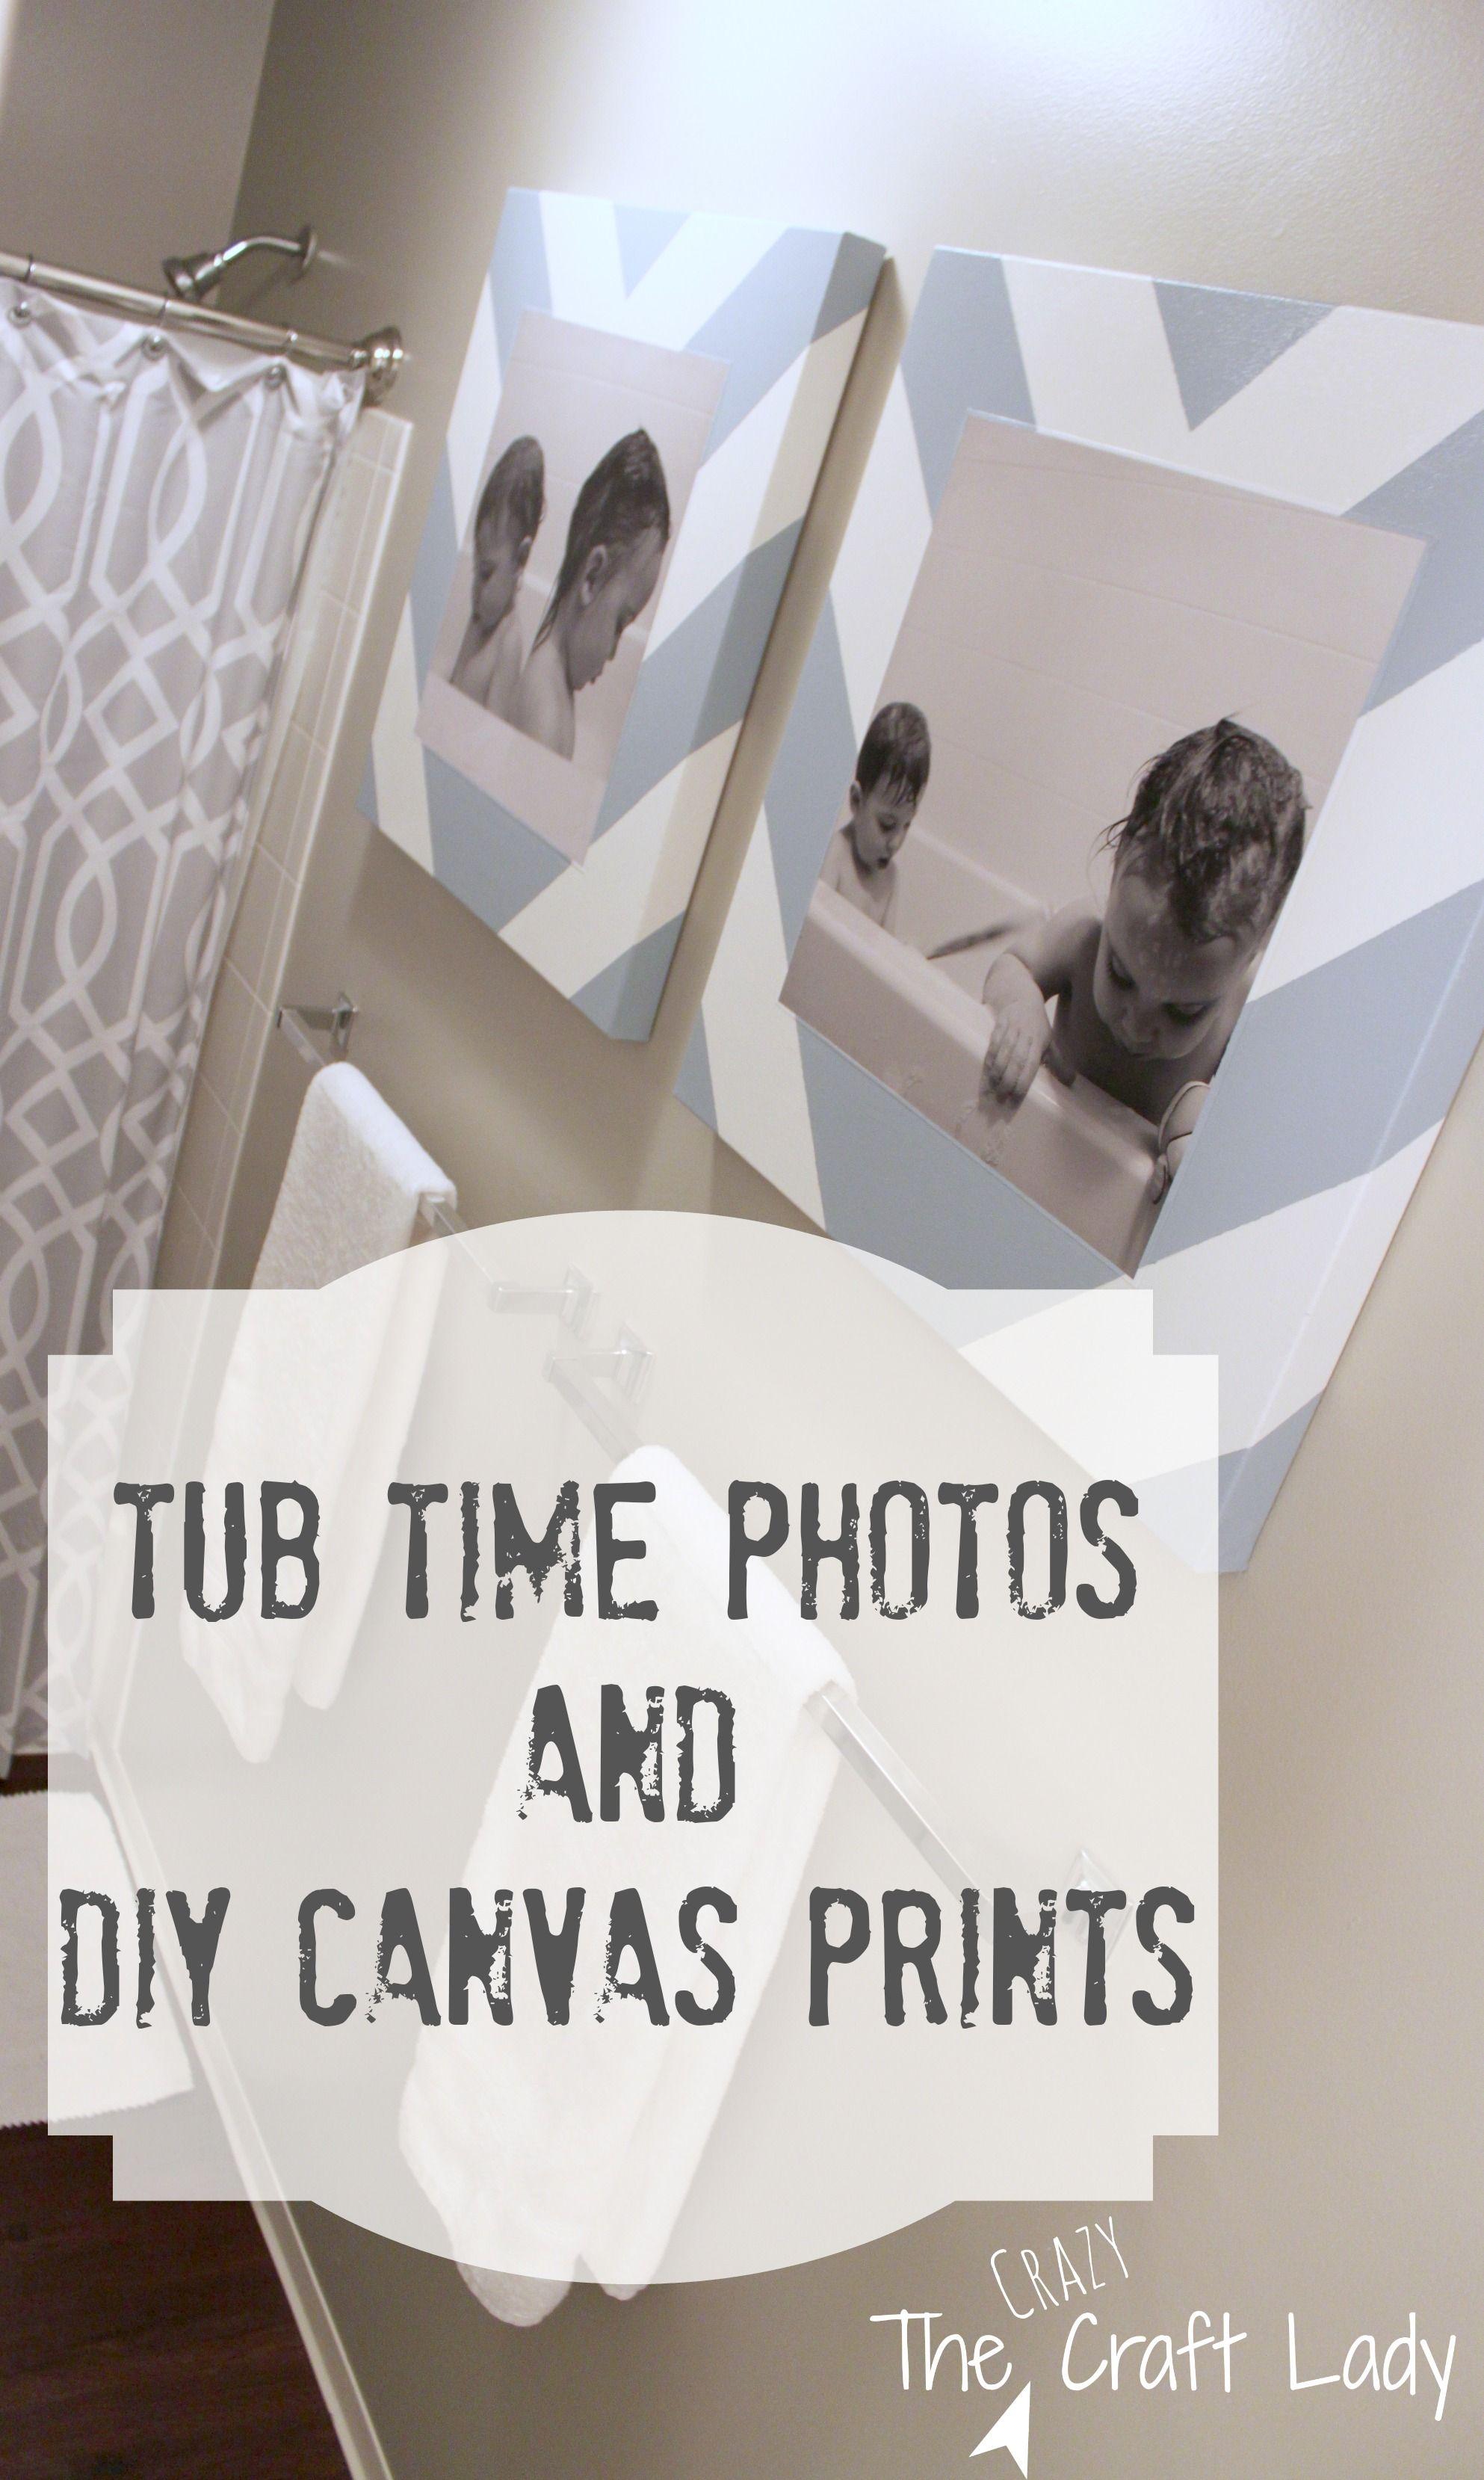 Bath Time Photos and DIY Canvas Prints Diy canvas Time photo and Bath